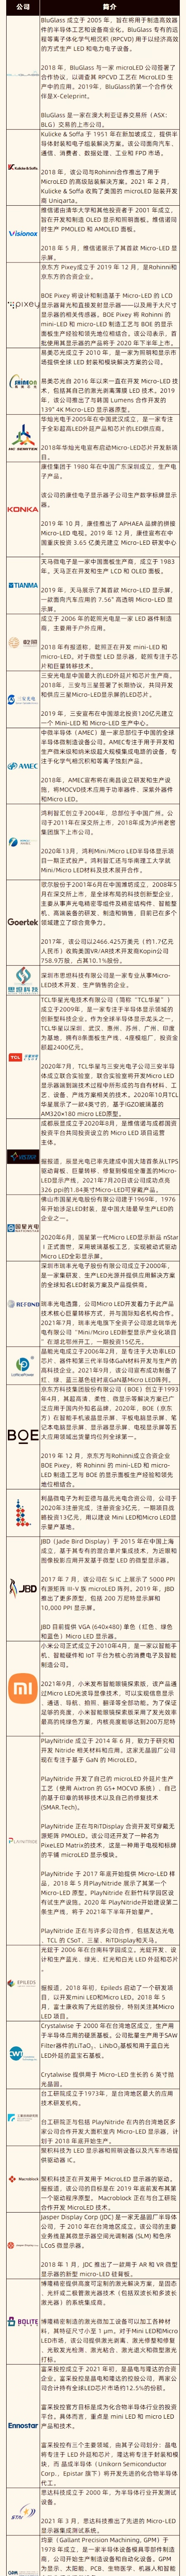 MicroLED全球厂商动态汇总2021年9月